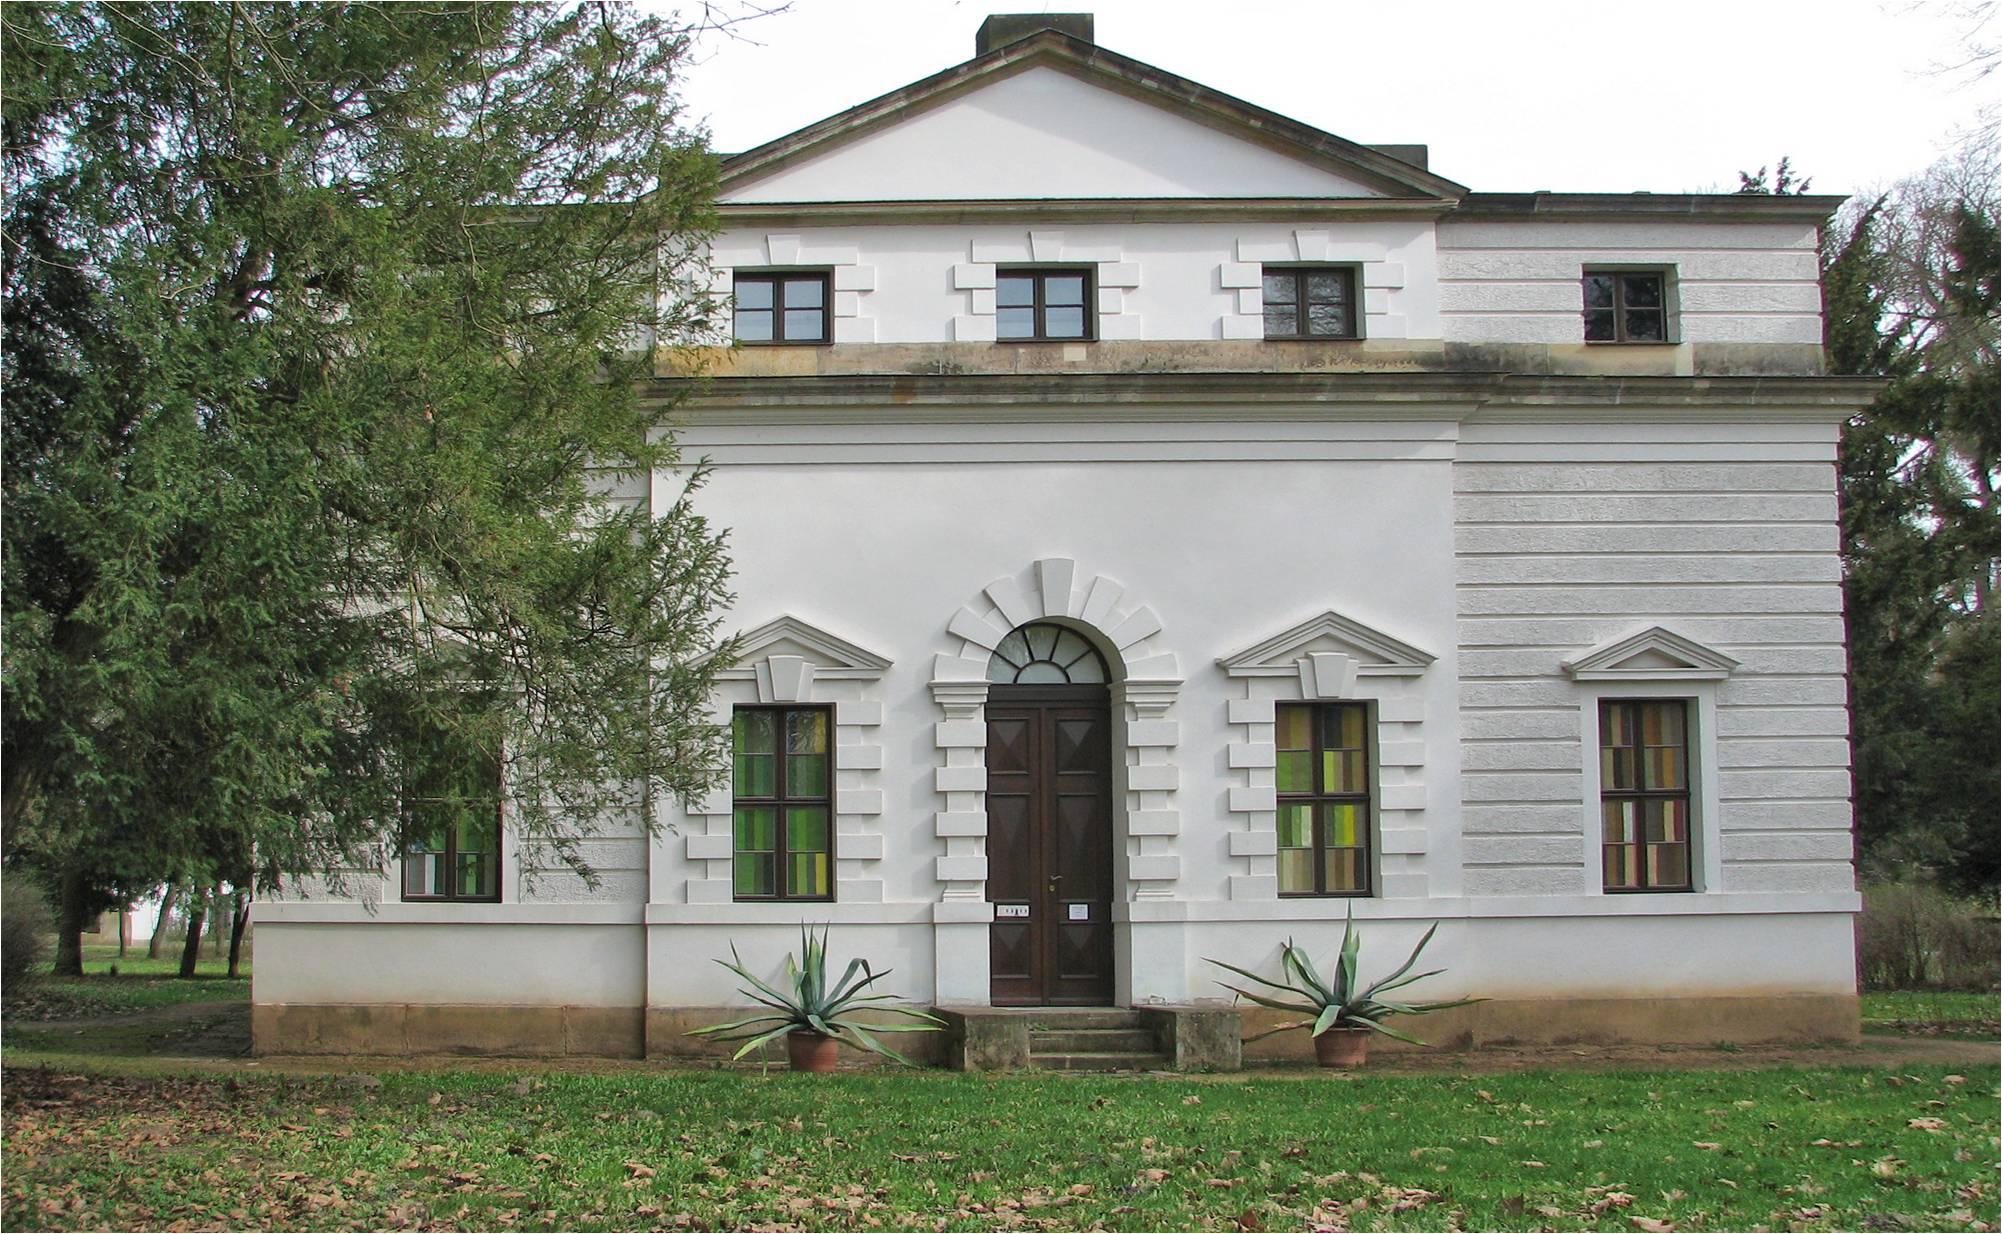 Fremdenhaus